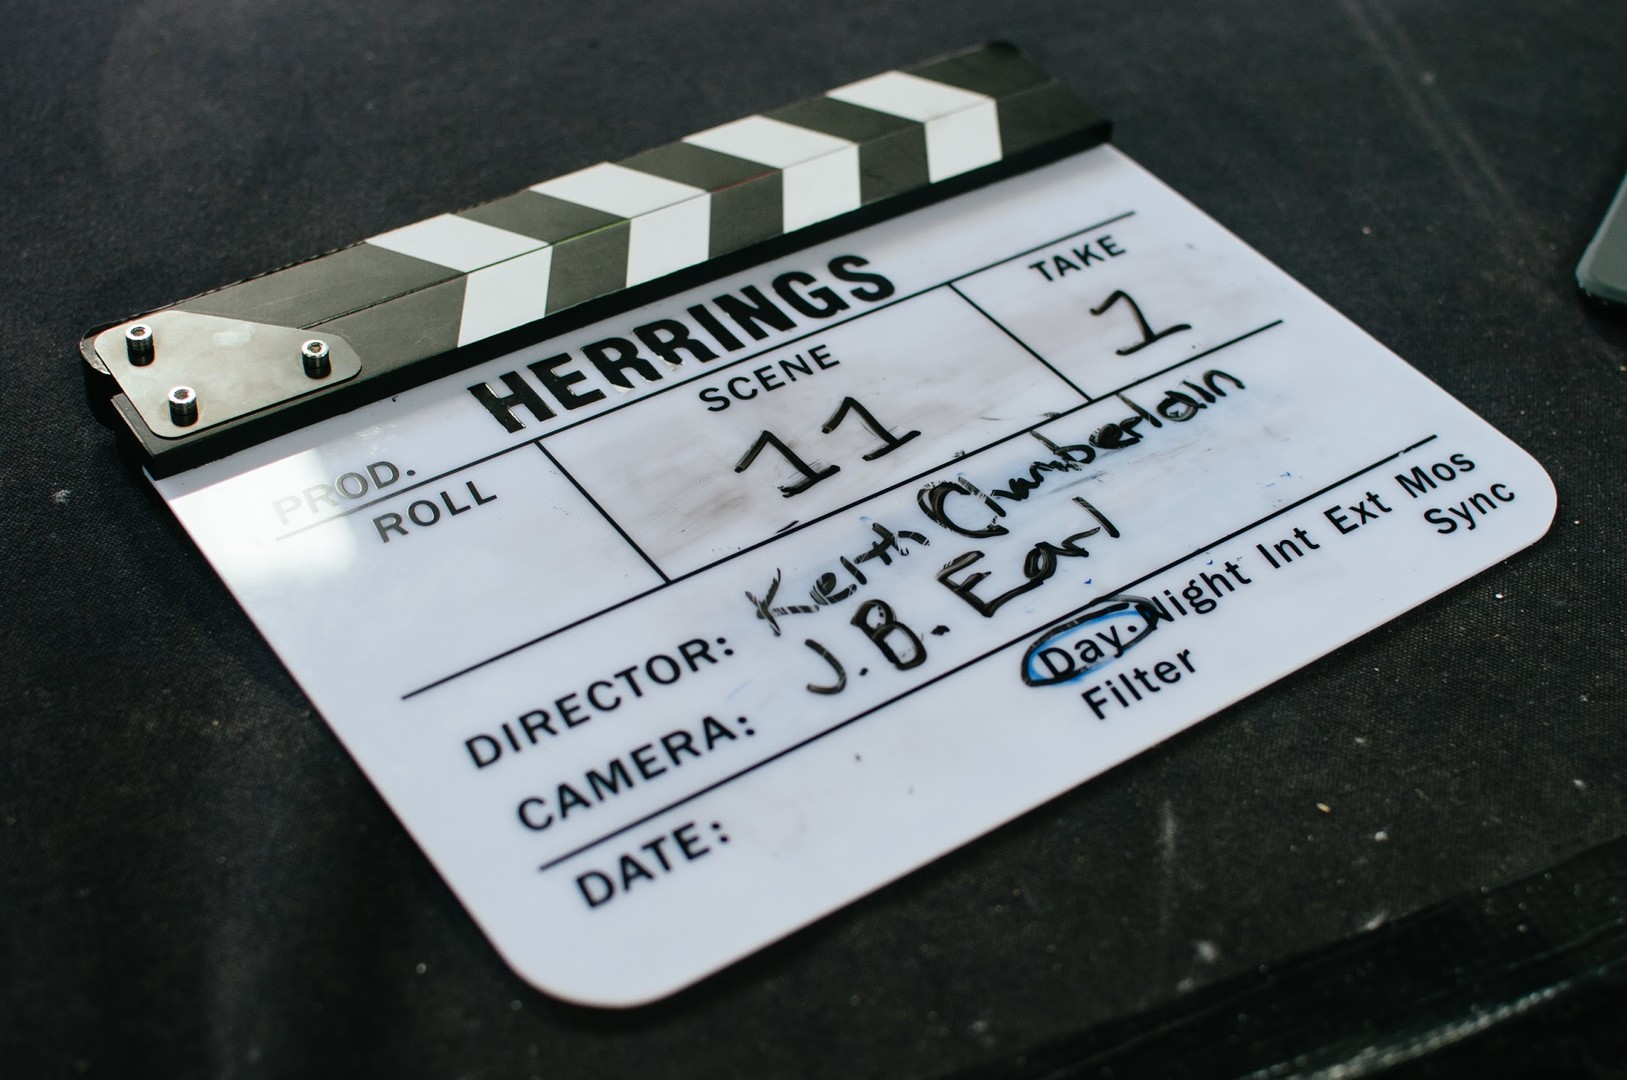 herring9